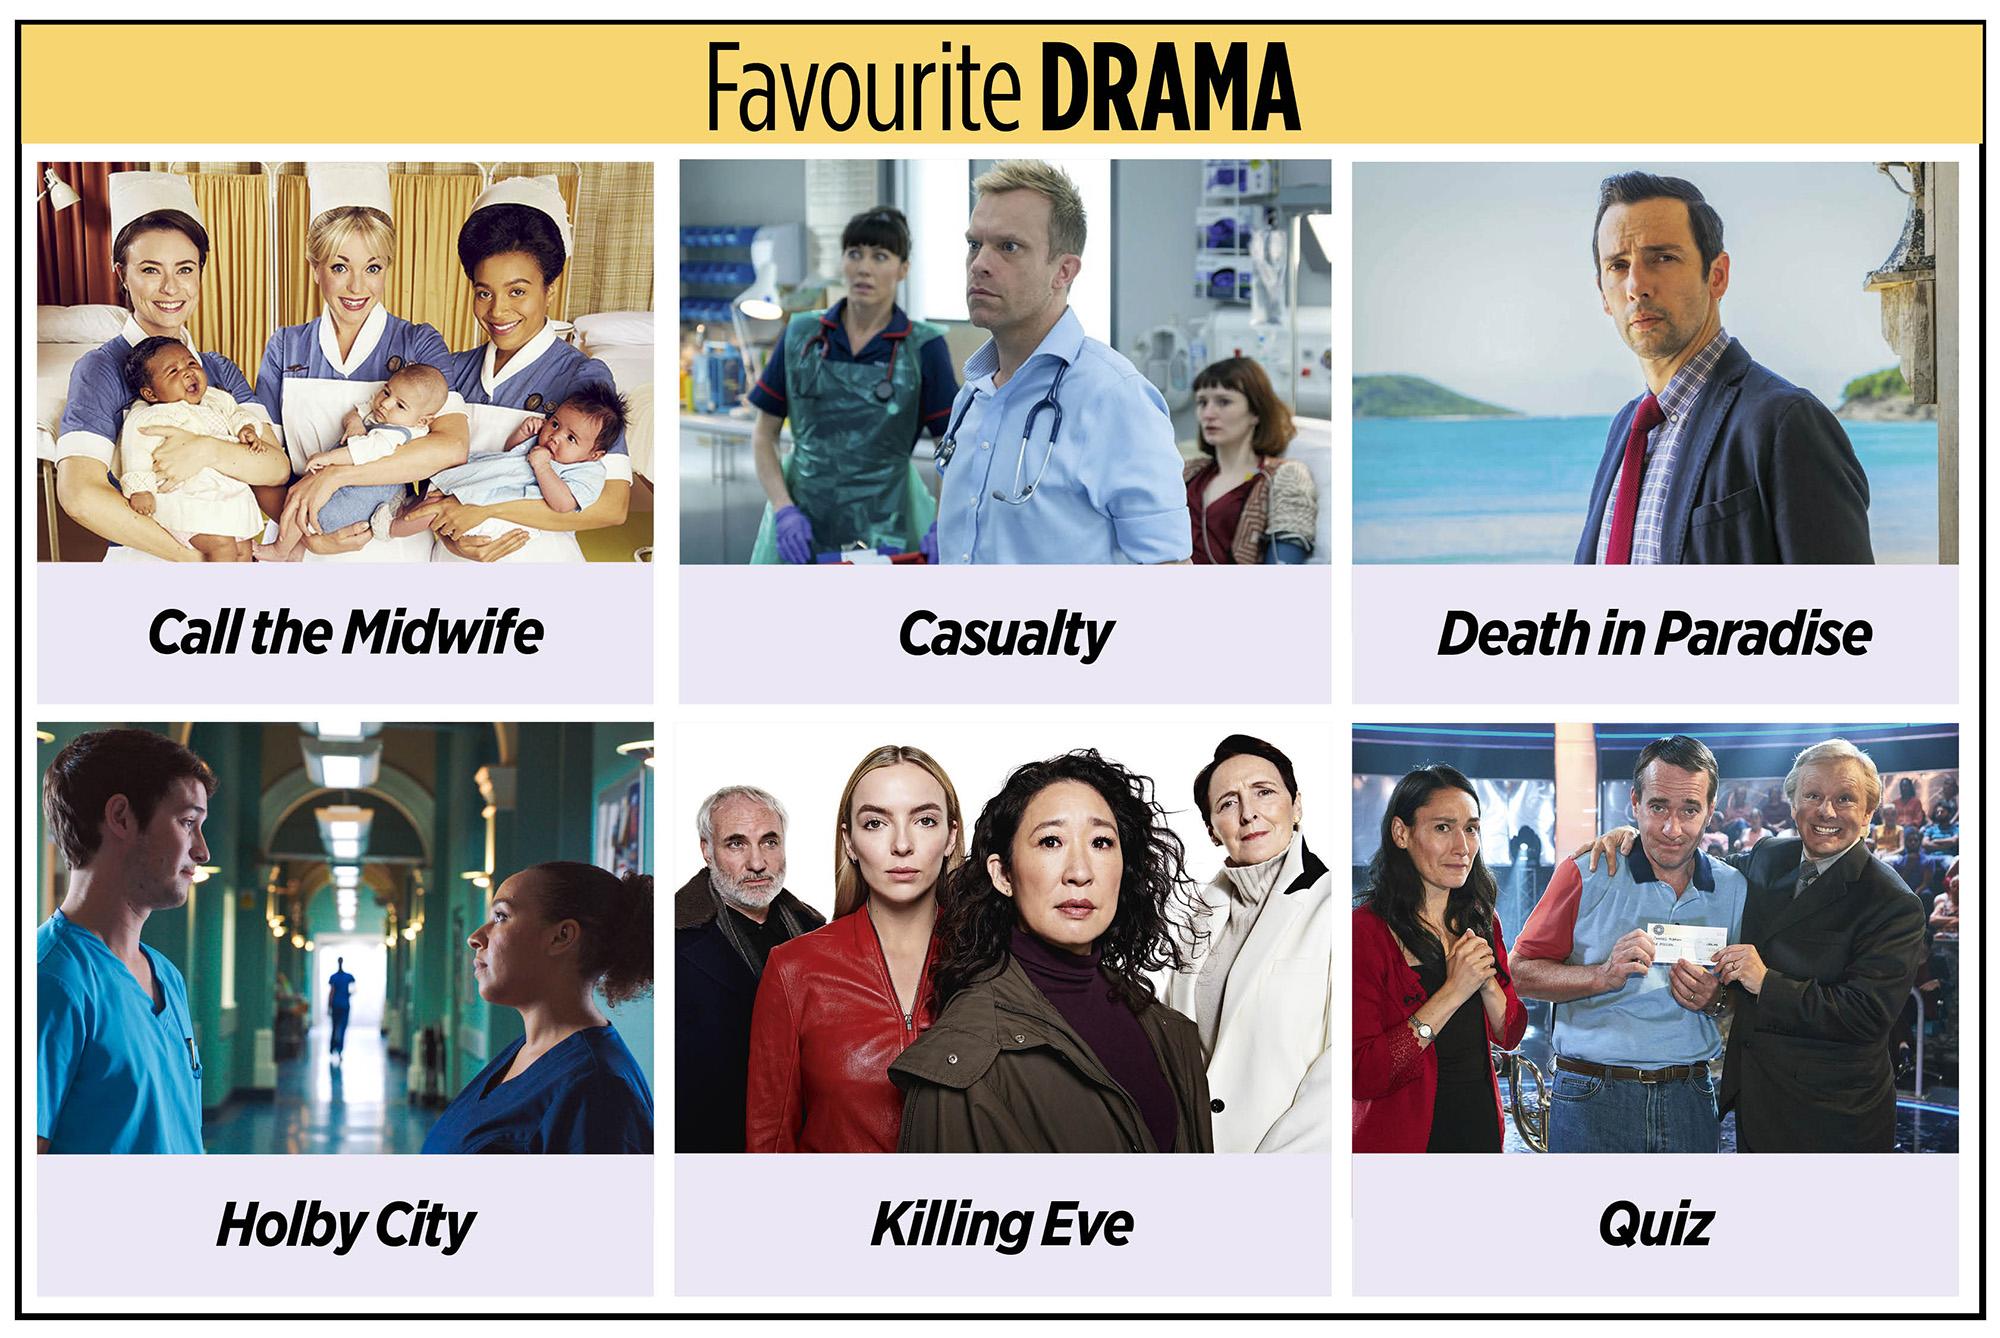 Drama favorito de TV Times Awards 2020